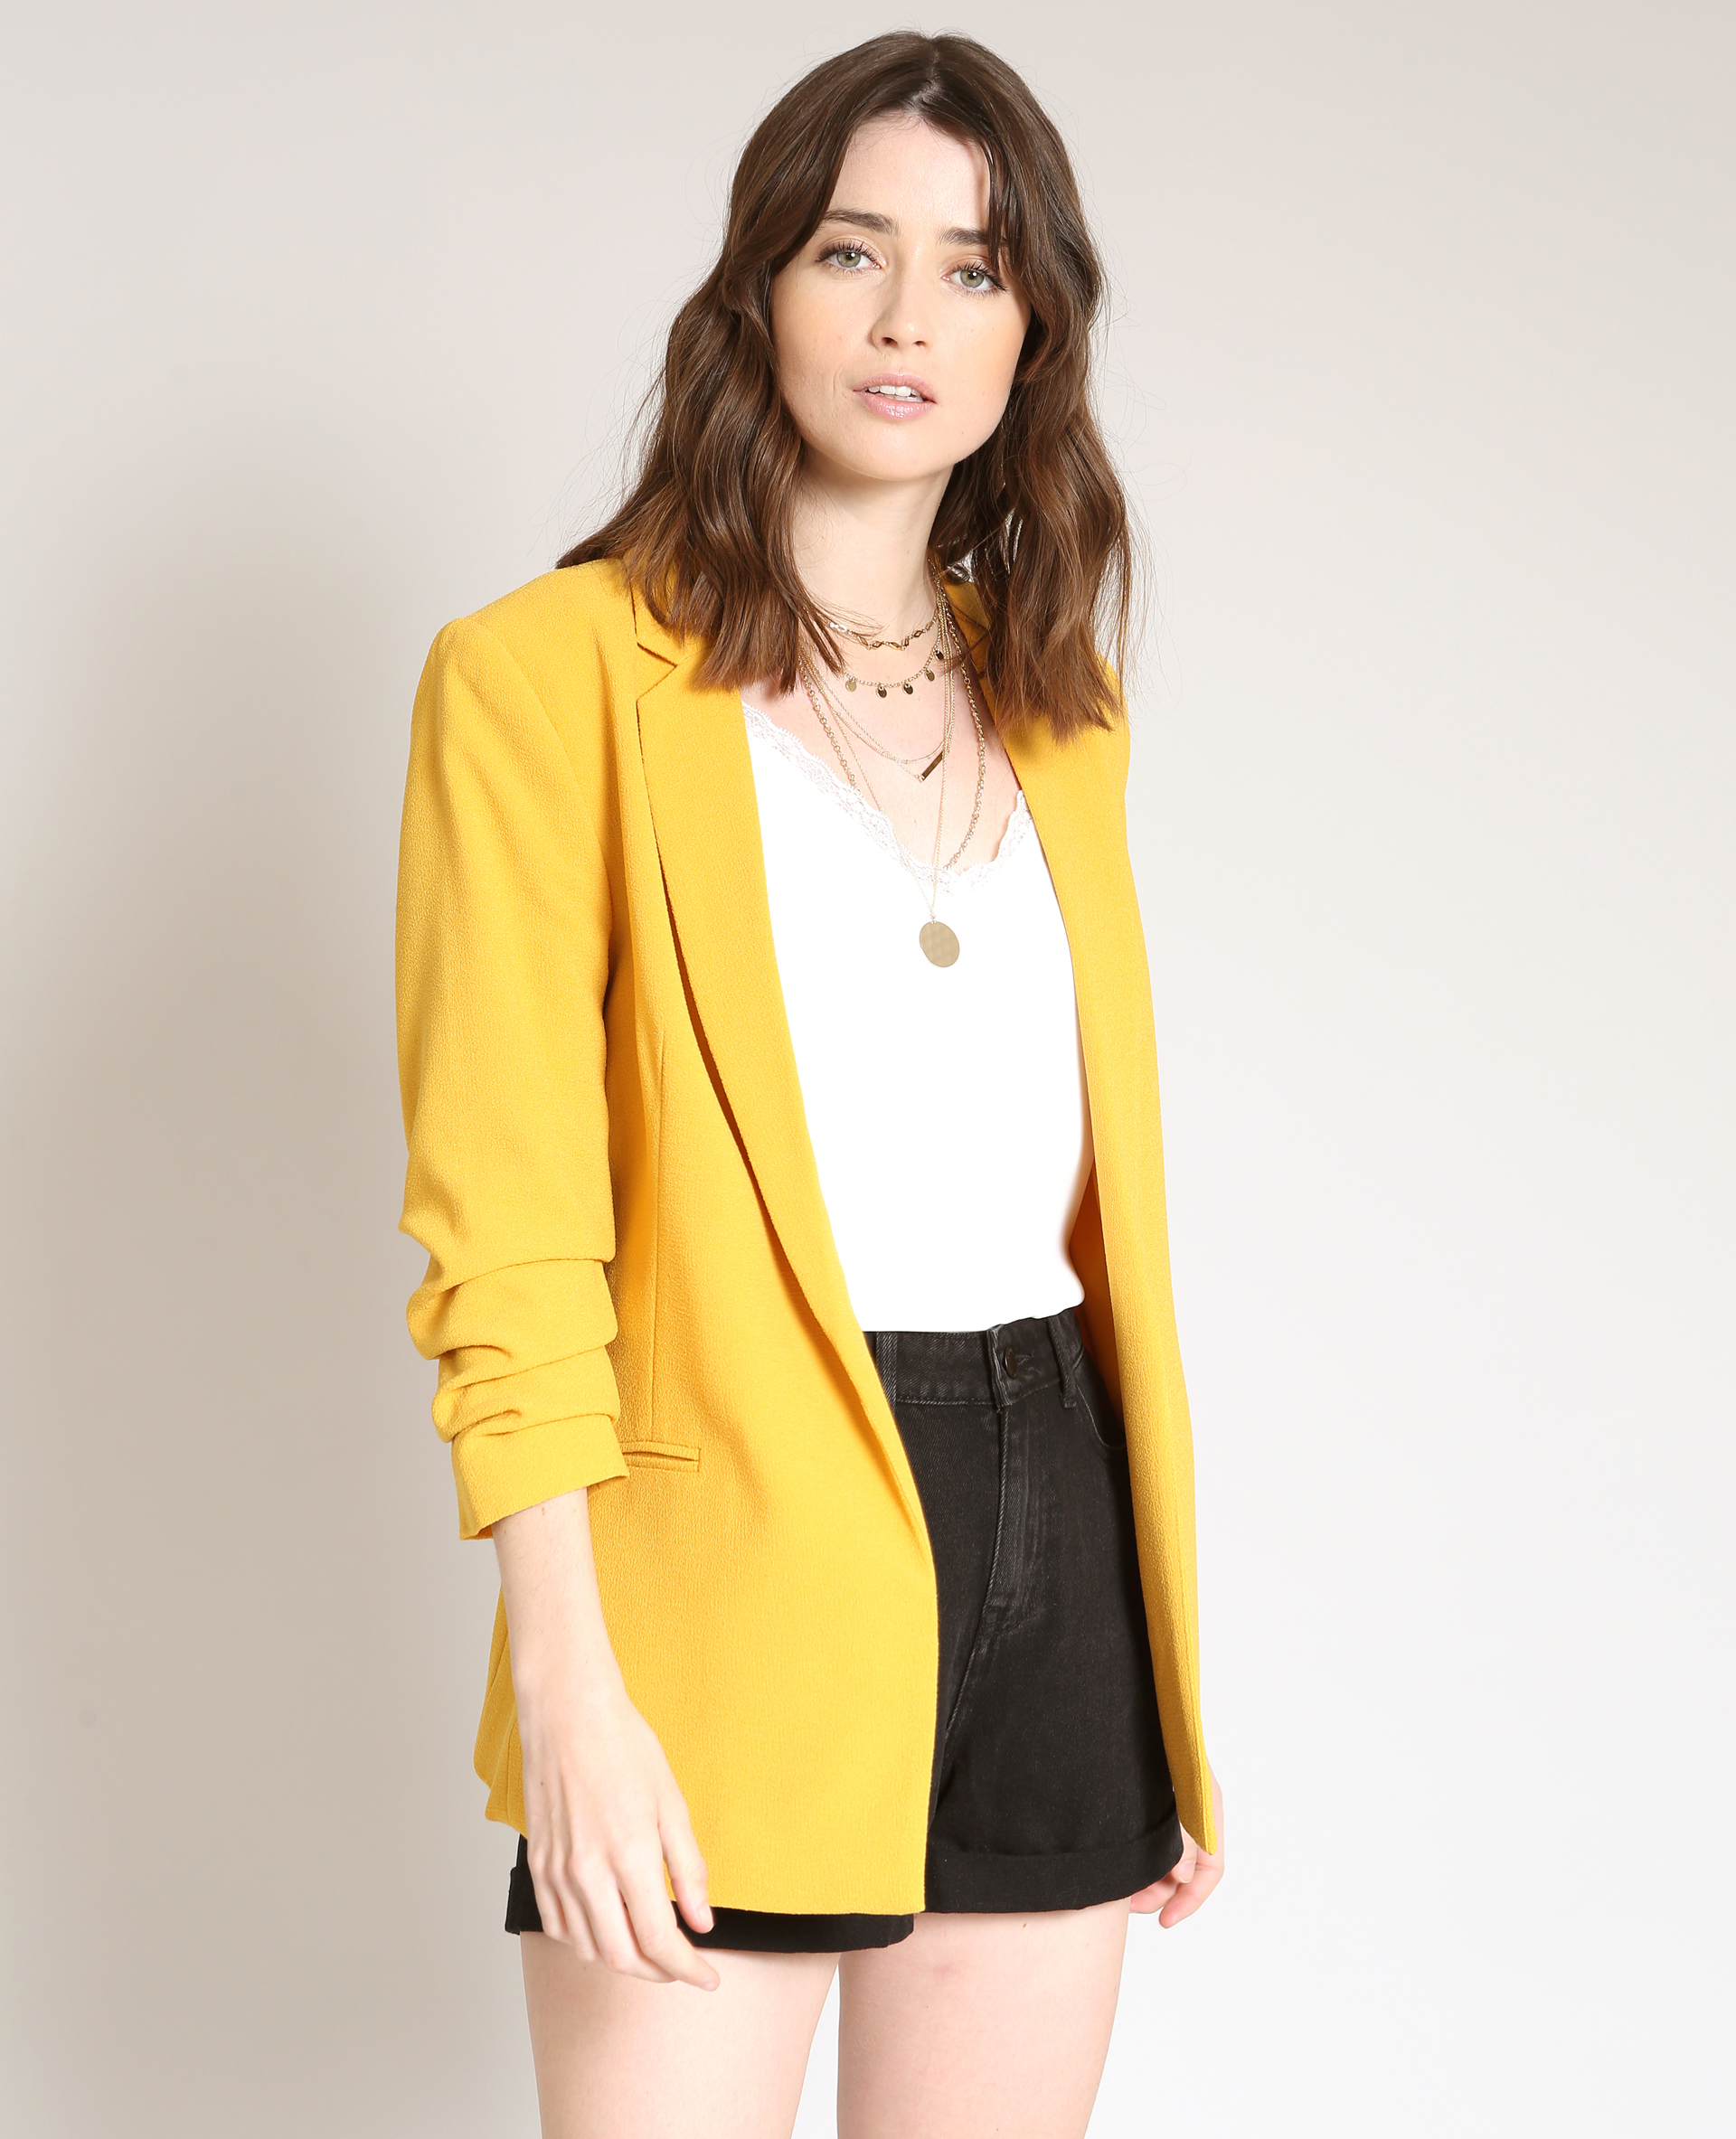 Veste jaune femme pimkie